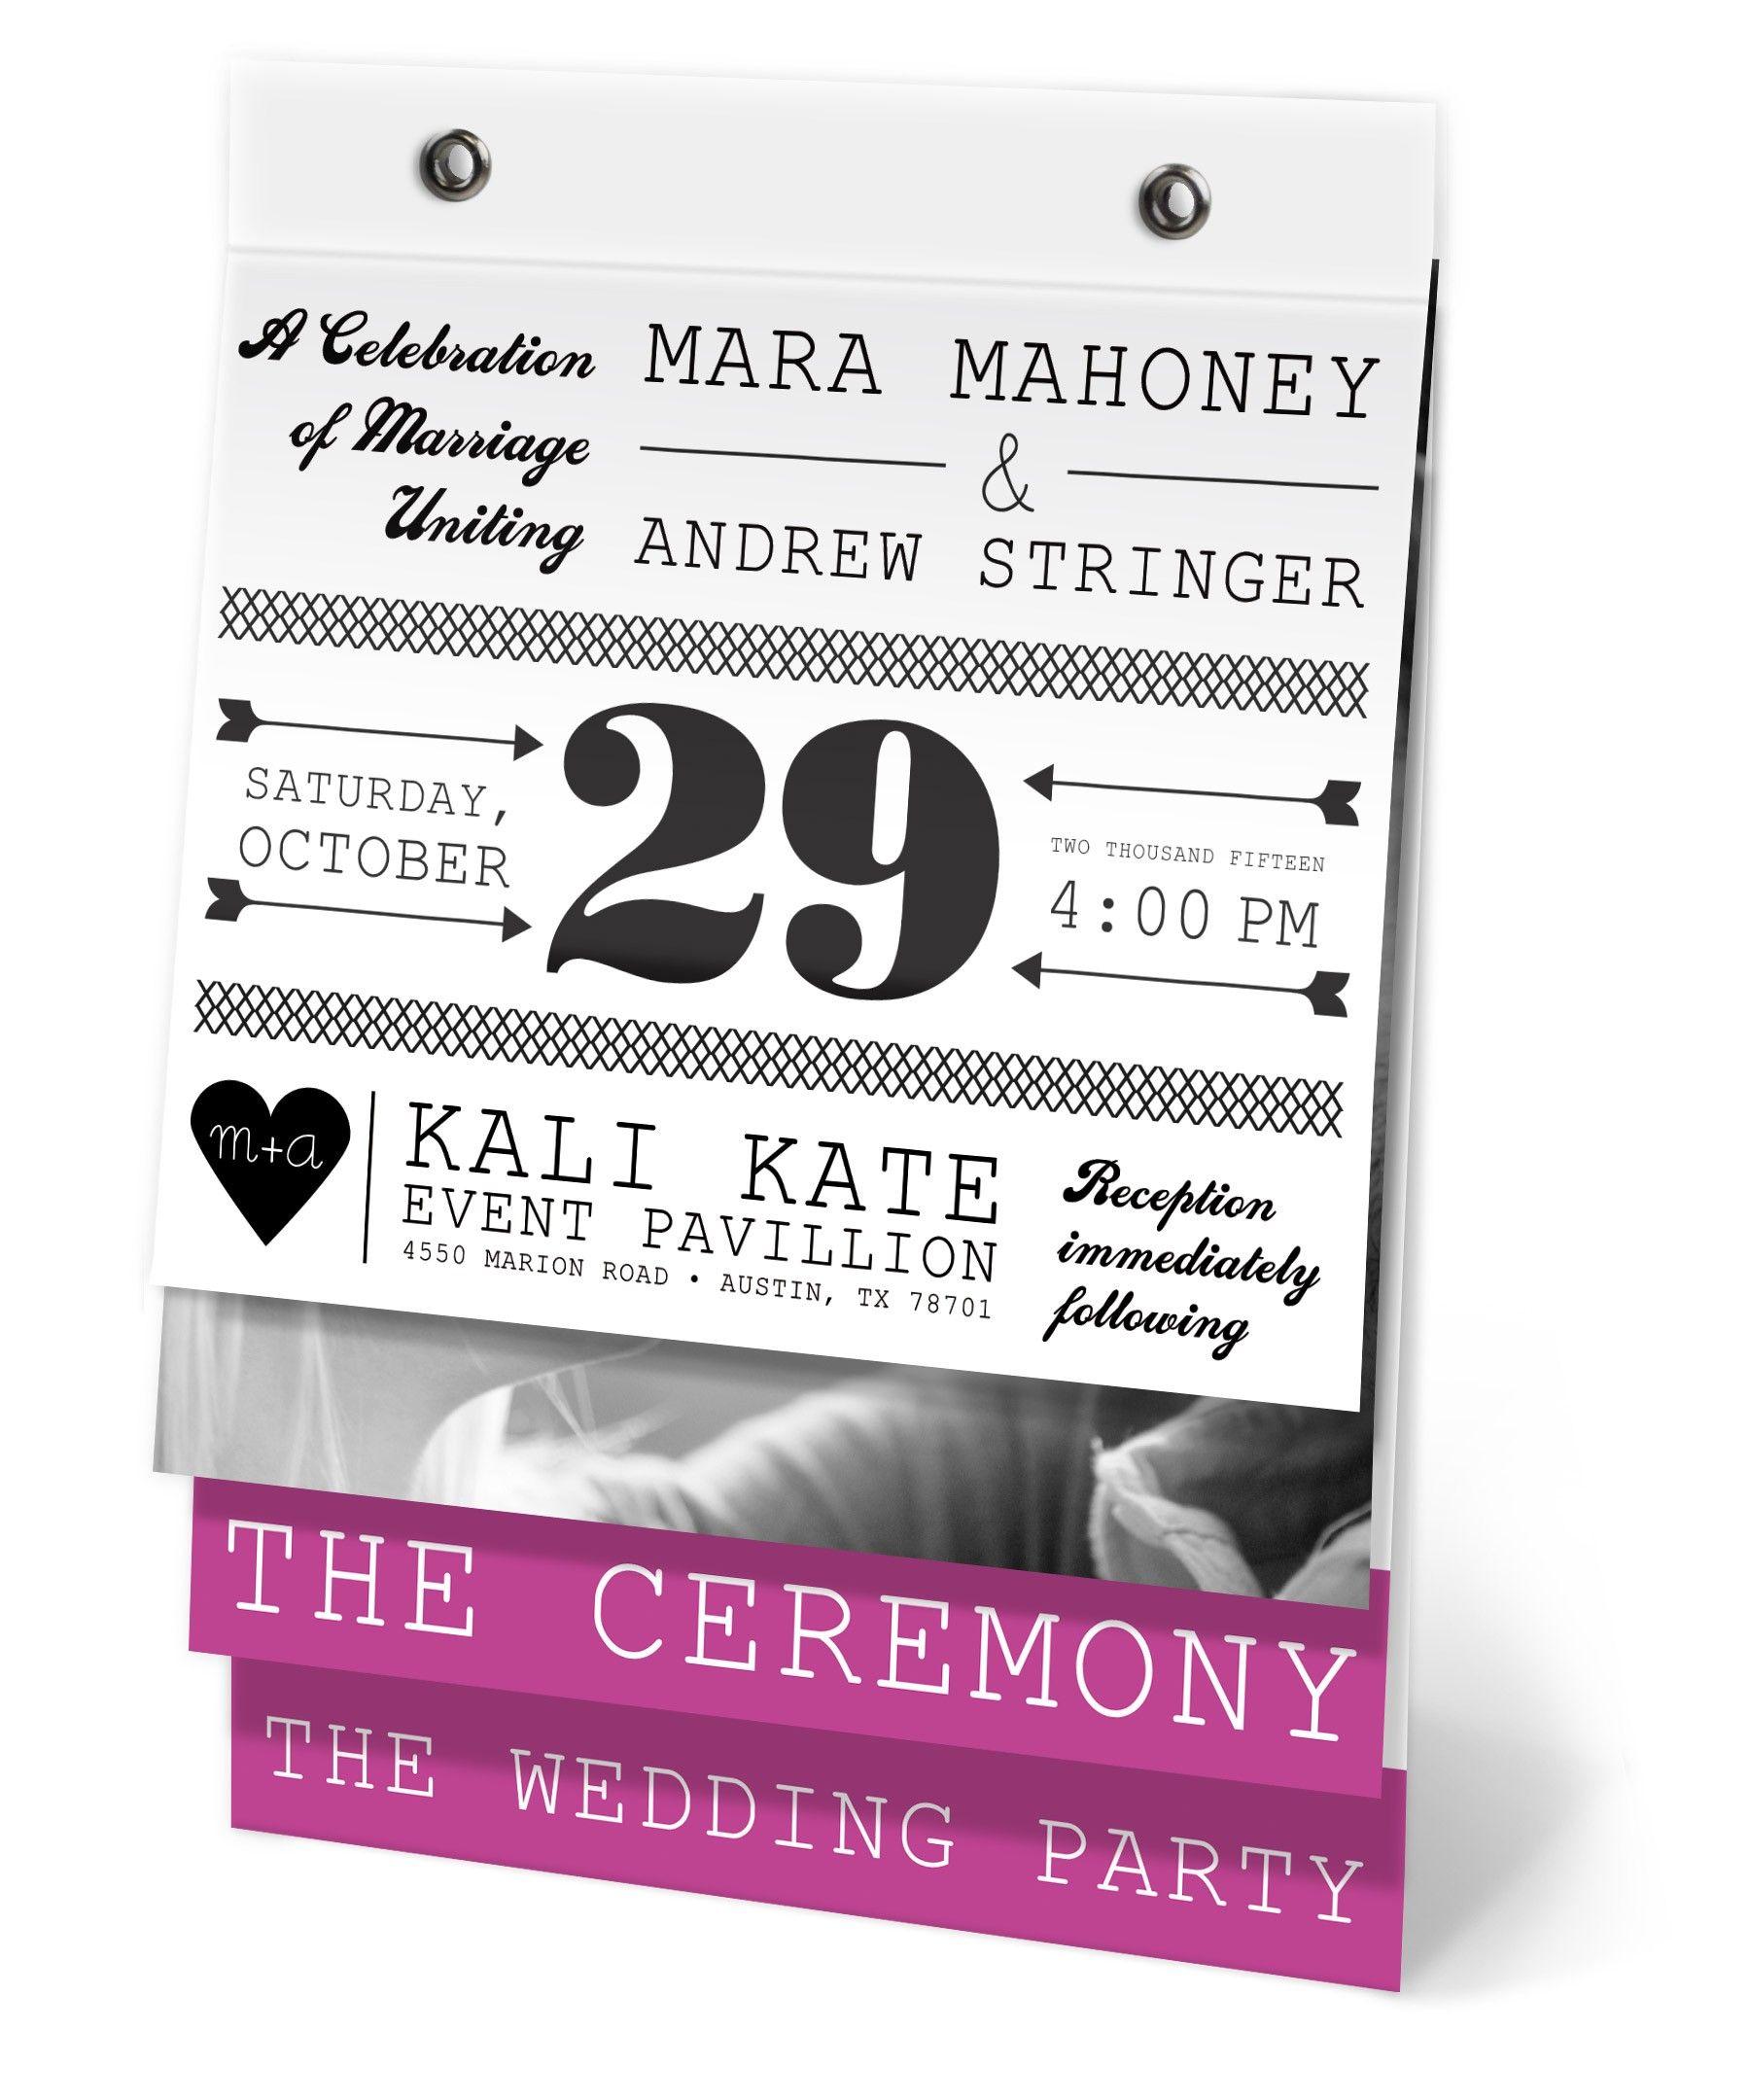 Super cute wedding program <3 Papersnaps.com has several ideas! | 9 ...